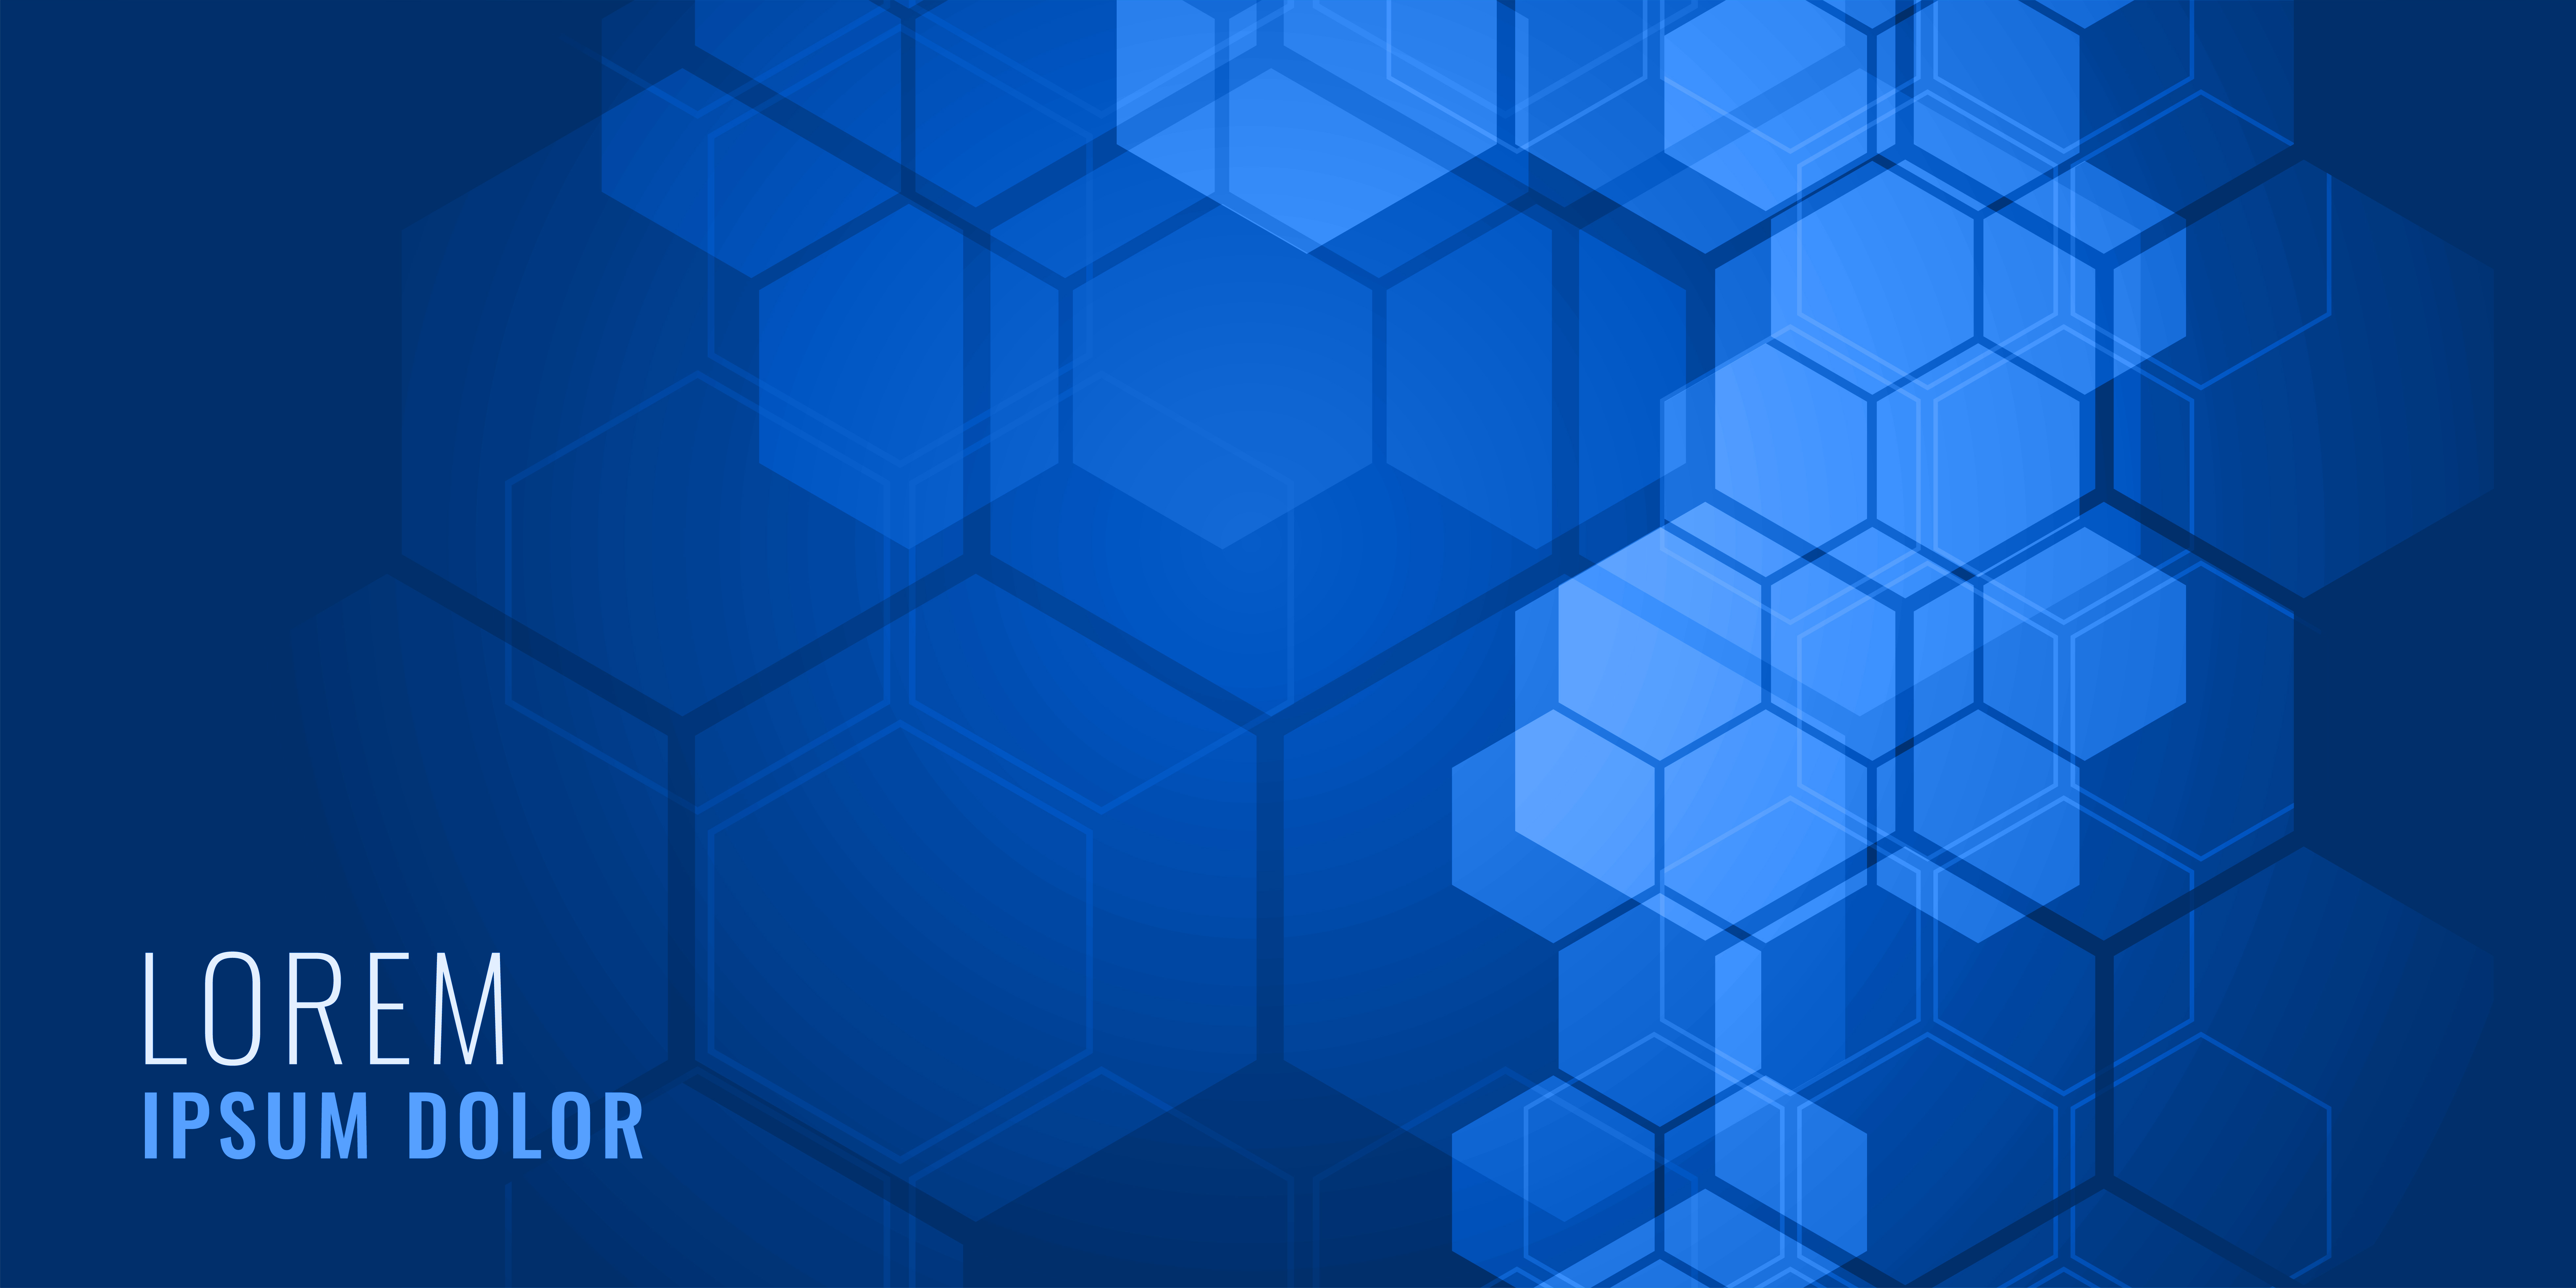 blue-hexagonal-shape-medical-background-concept-vector.jpg